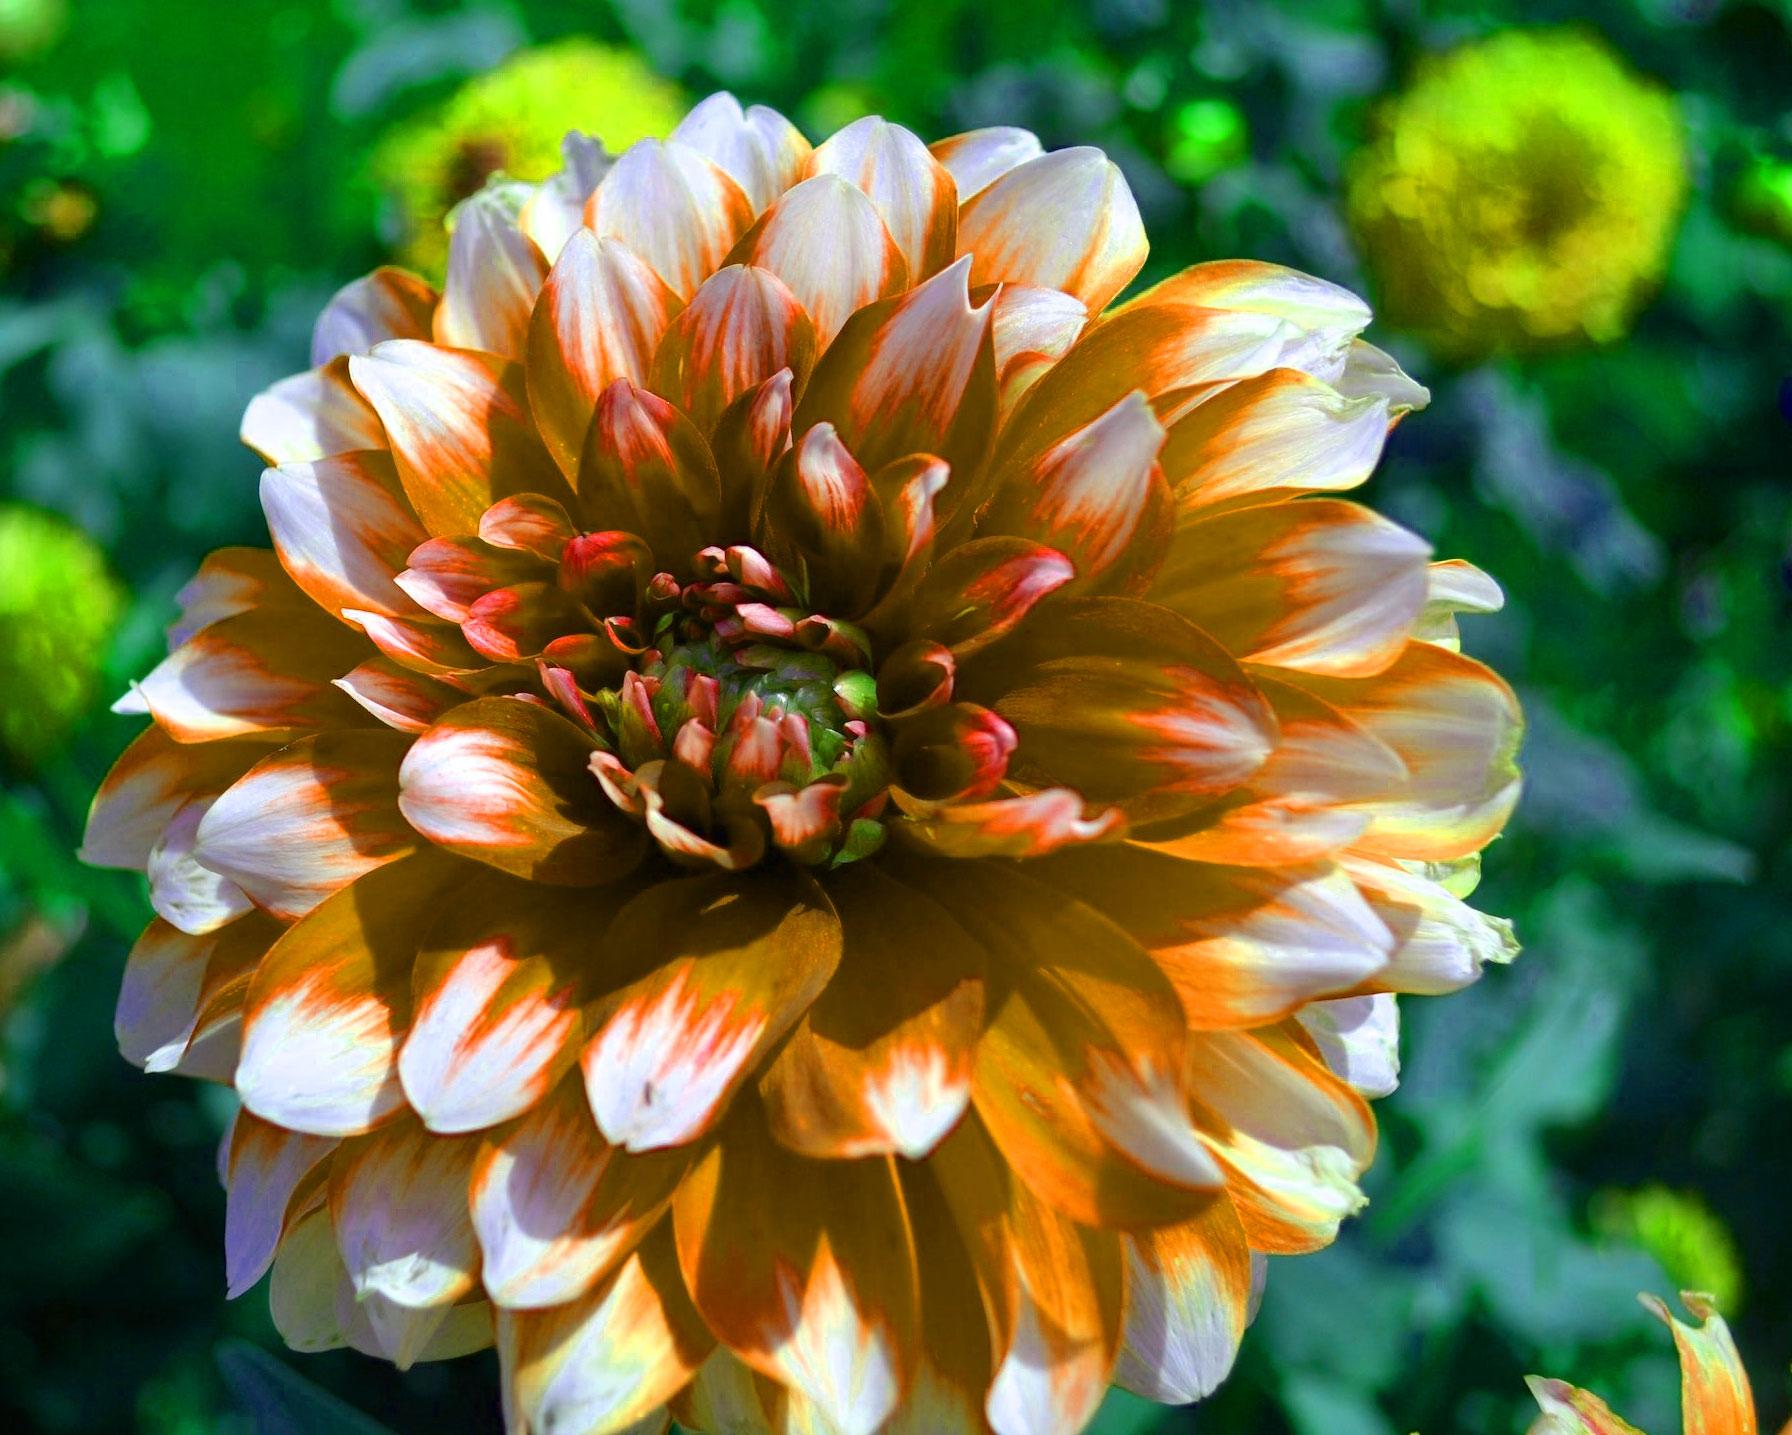 Top HD Flower DP Images